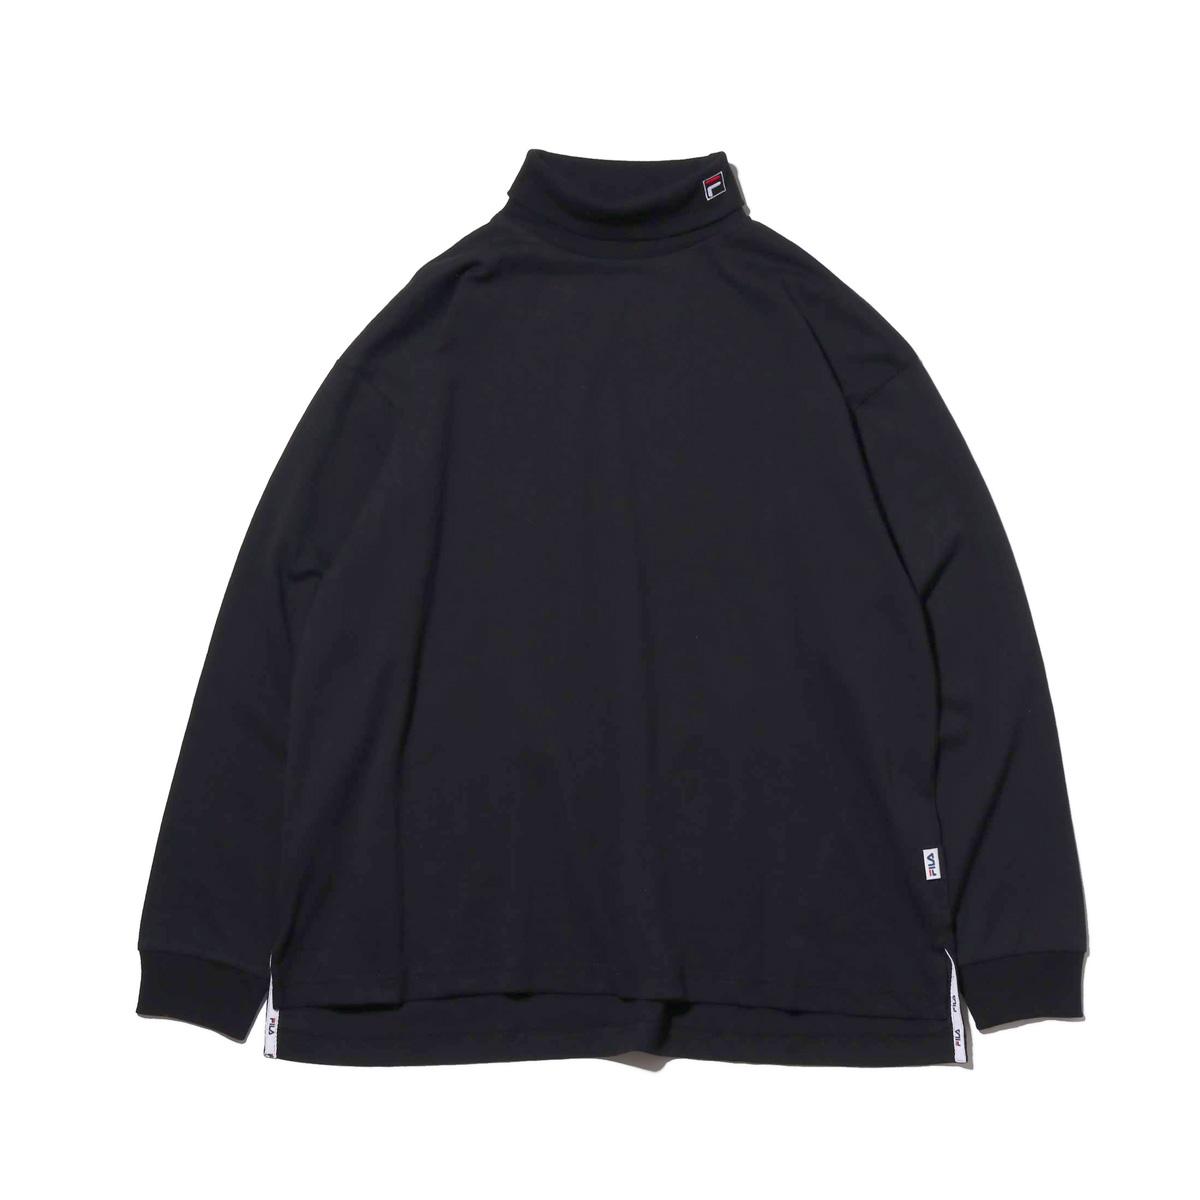 FILA Turtle neck shirt (フィラ タートルネック)BLACK【メンズ 長袖Tシャツ】18FW-I